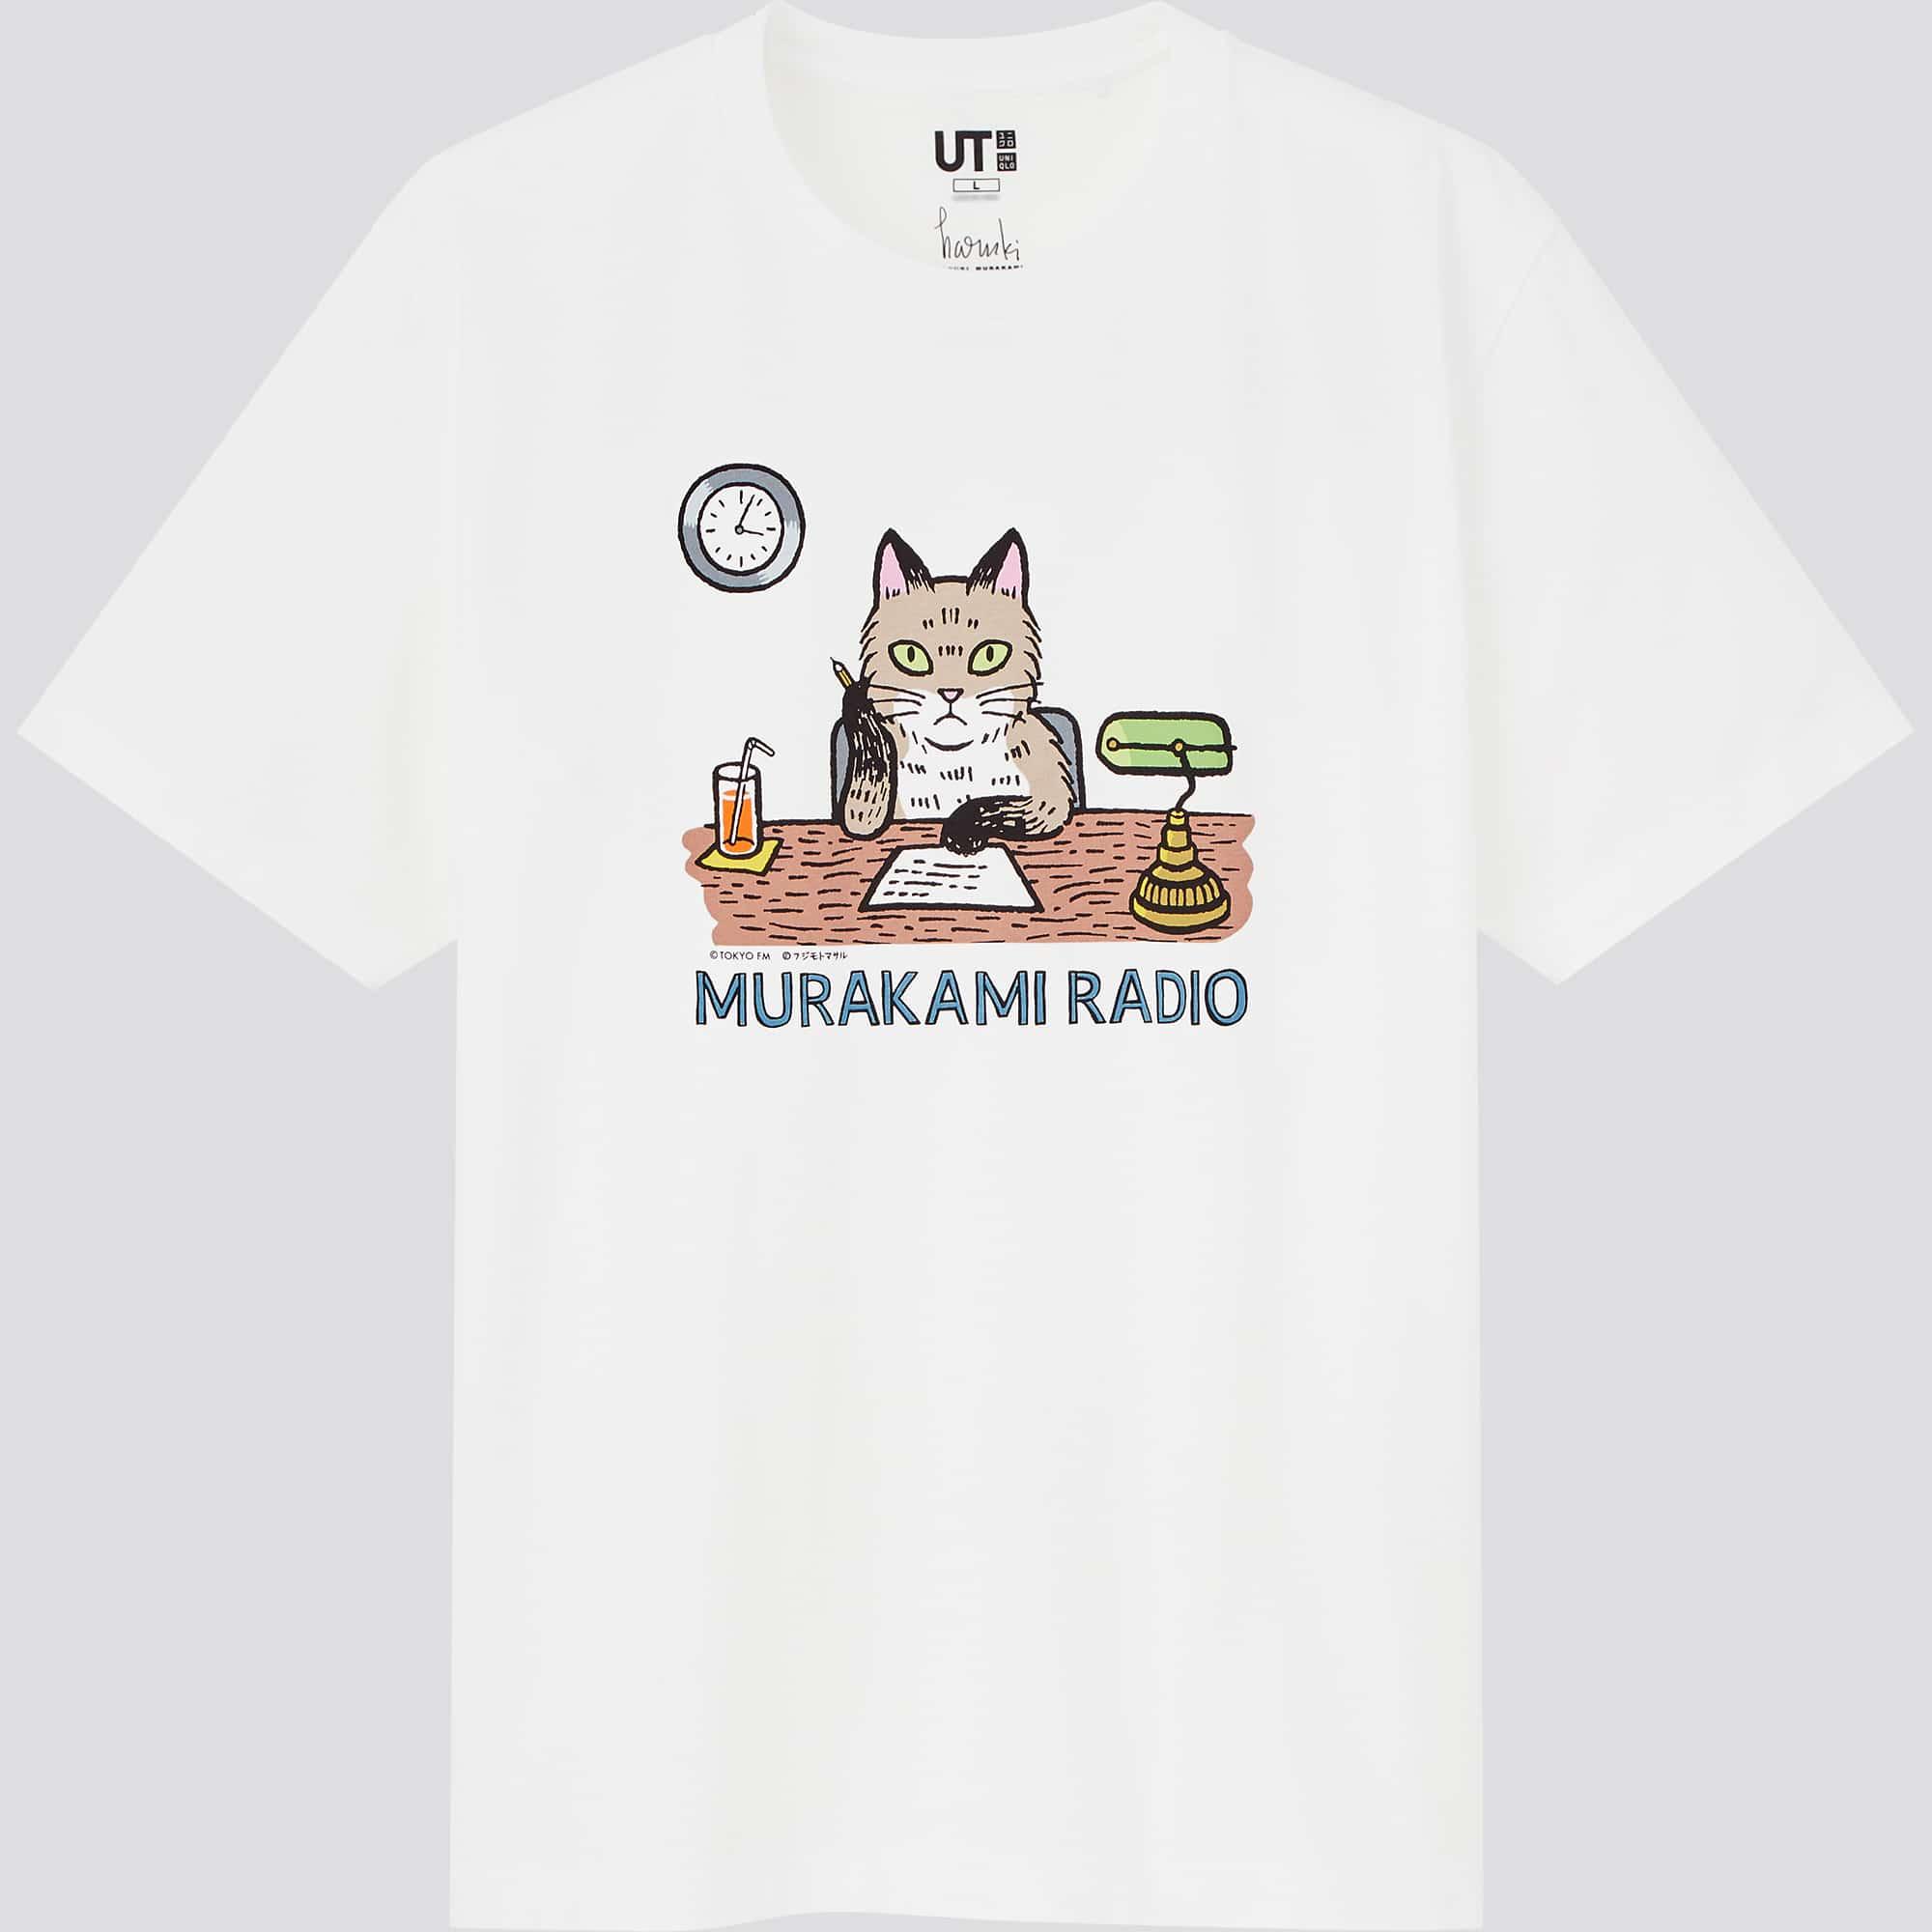 Uniqlo brings the creative world of Haruki Murakami to its new UT collection 22